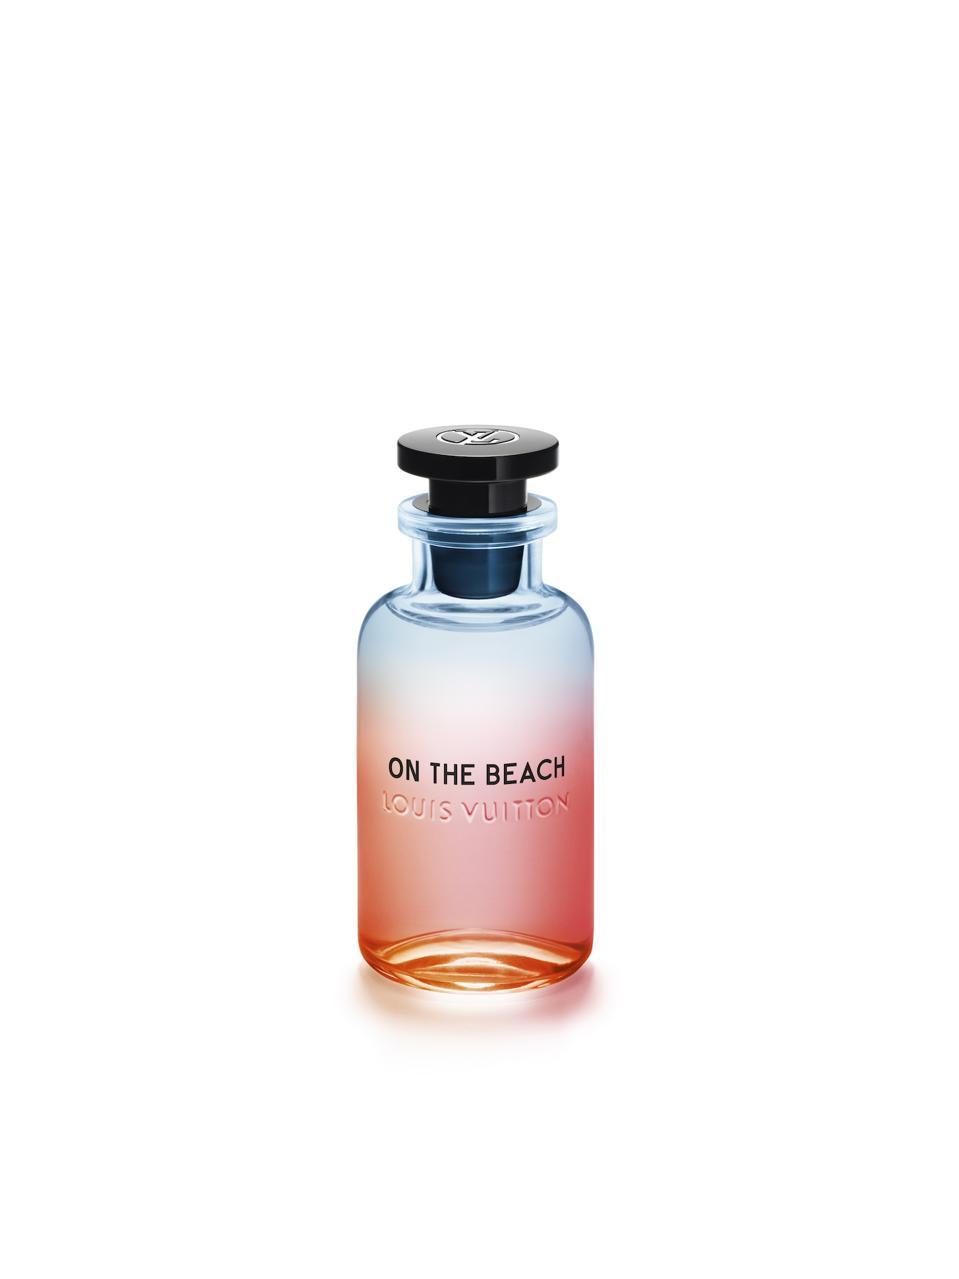 Louis Vuitton On the Beach